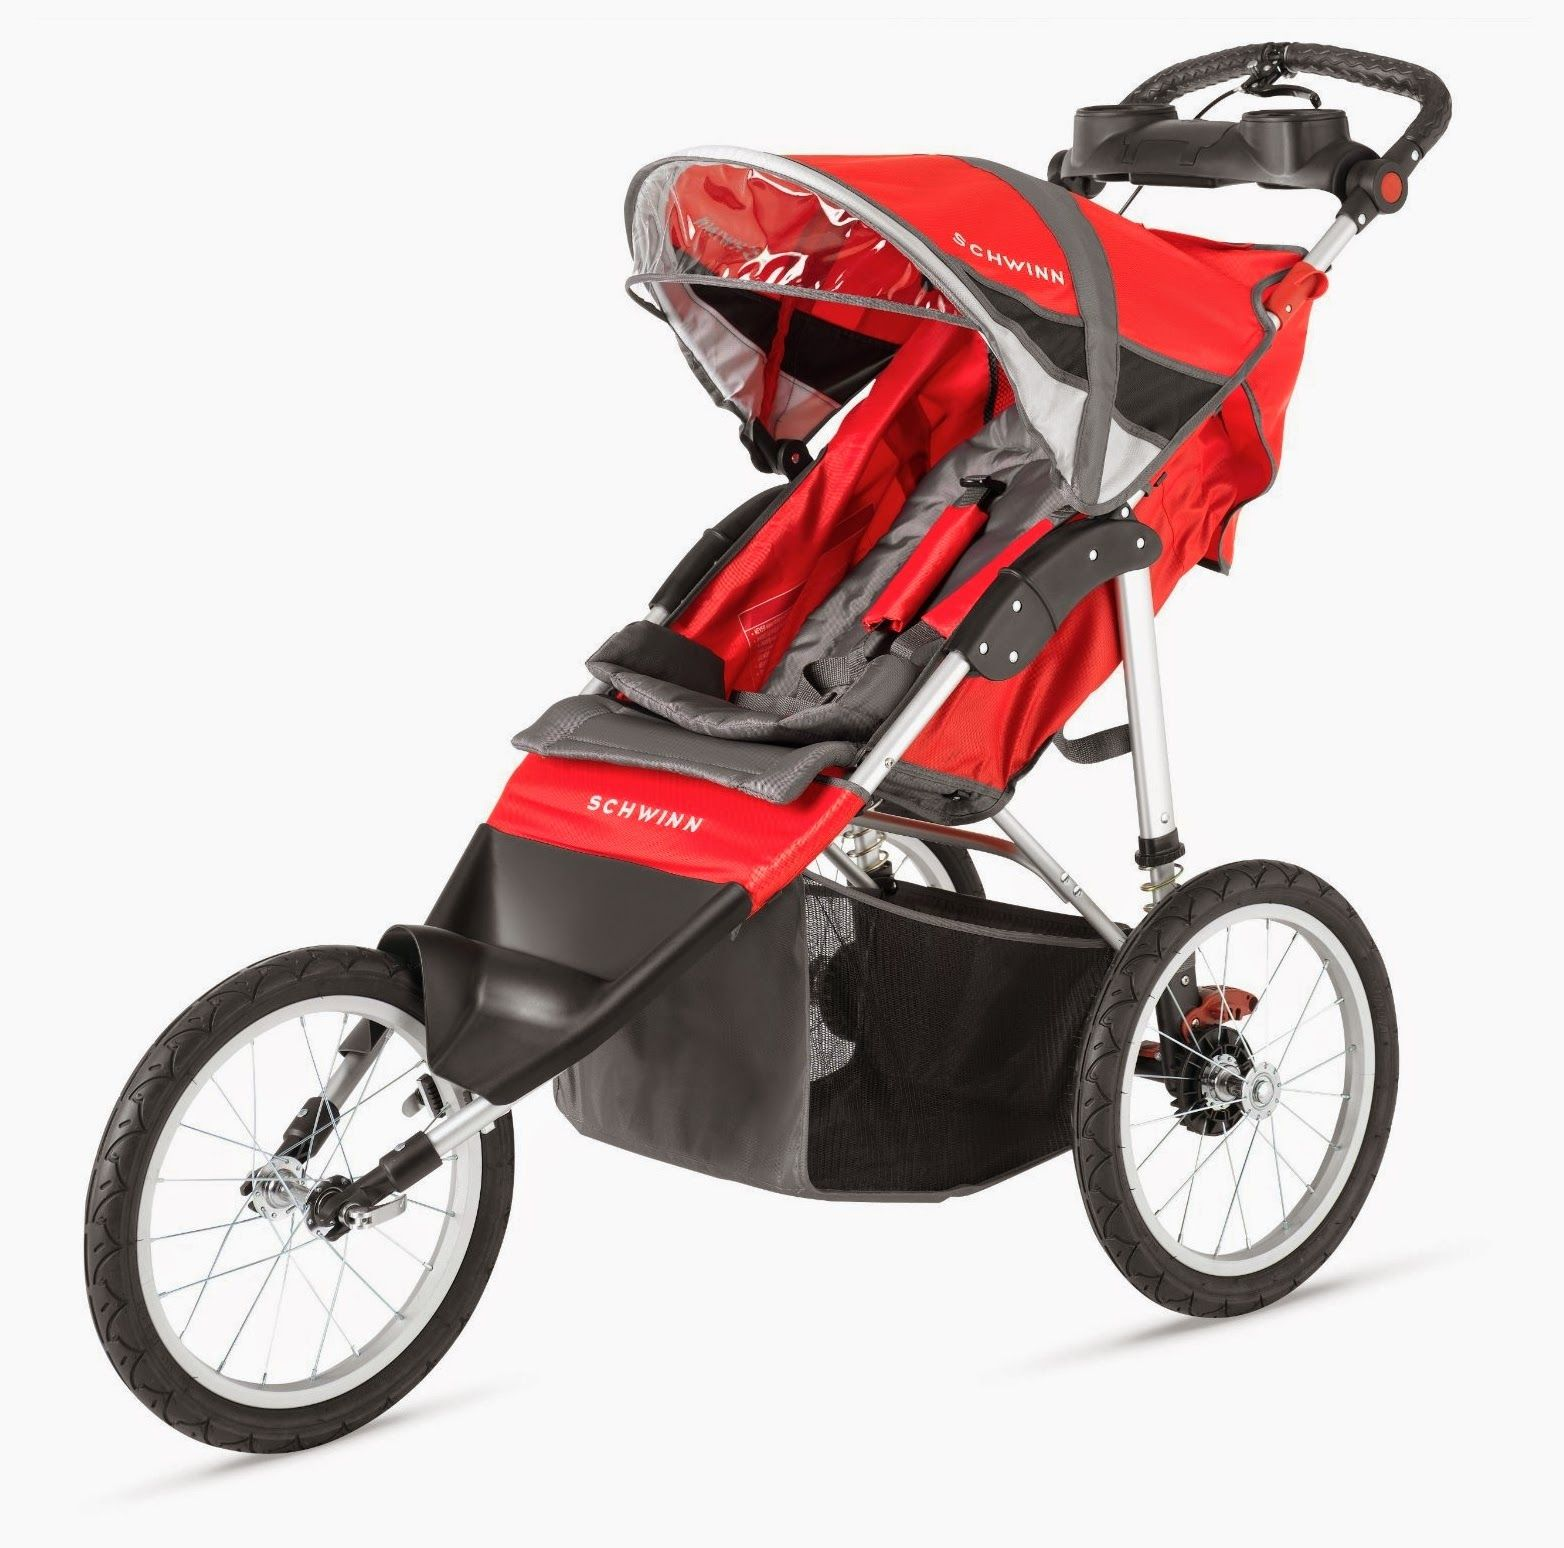 schwinn double jogging stroller is best option for parents